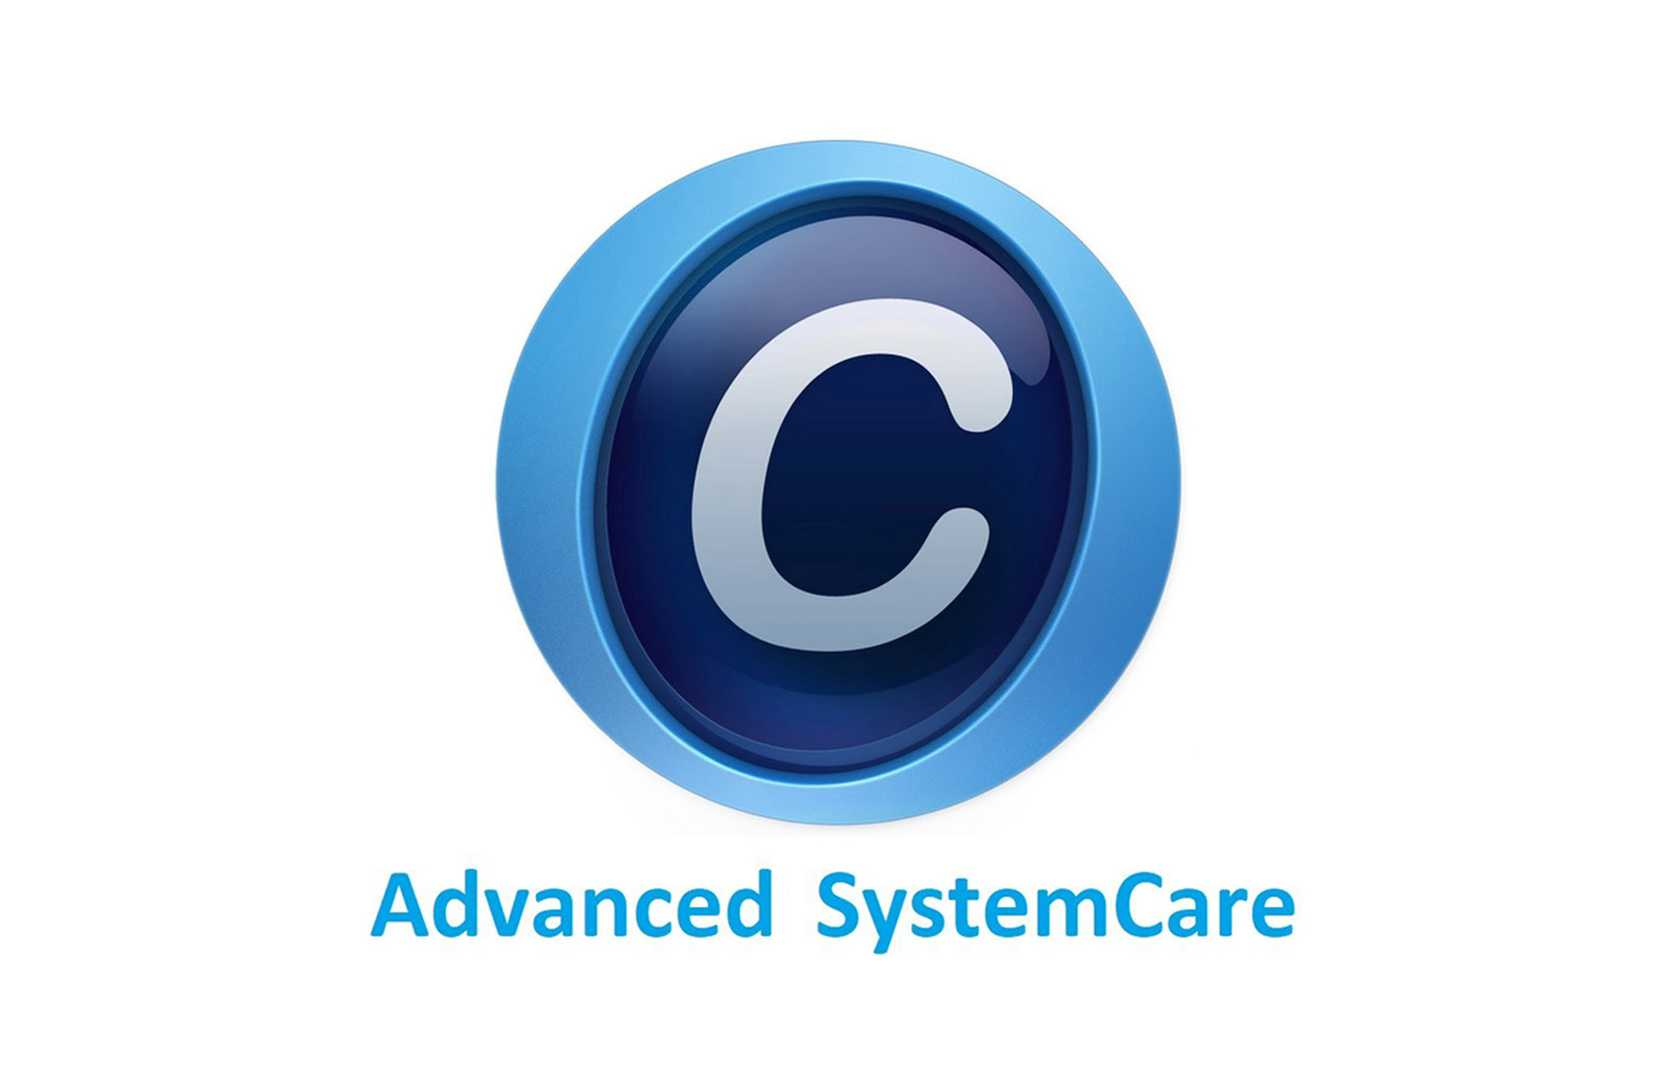 advancedsystemcare-1555327242.jpg